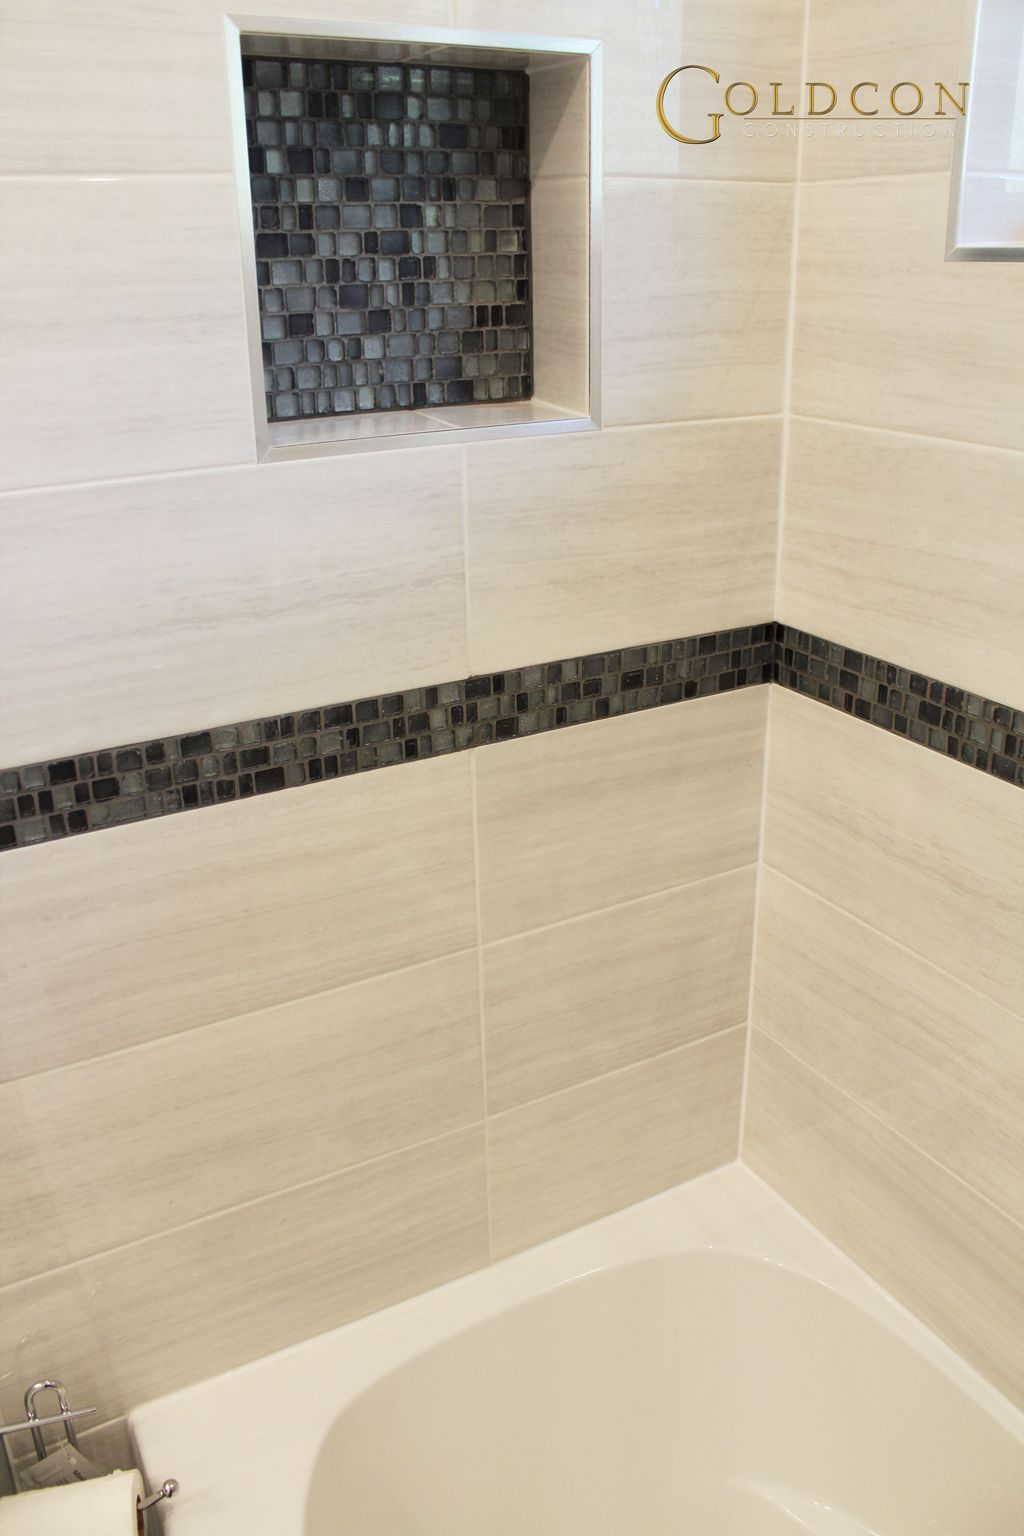 Mid america tile elk grove village - Beautiful Bathroom Renovation Project Featuring 8 X 20 Wall Tiles 12 X